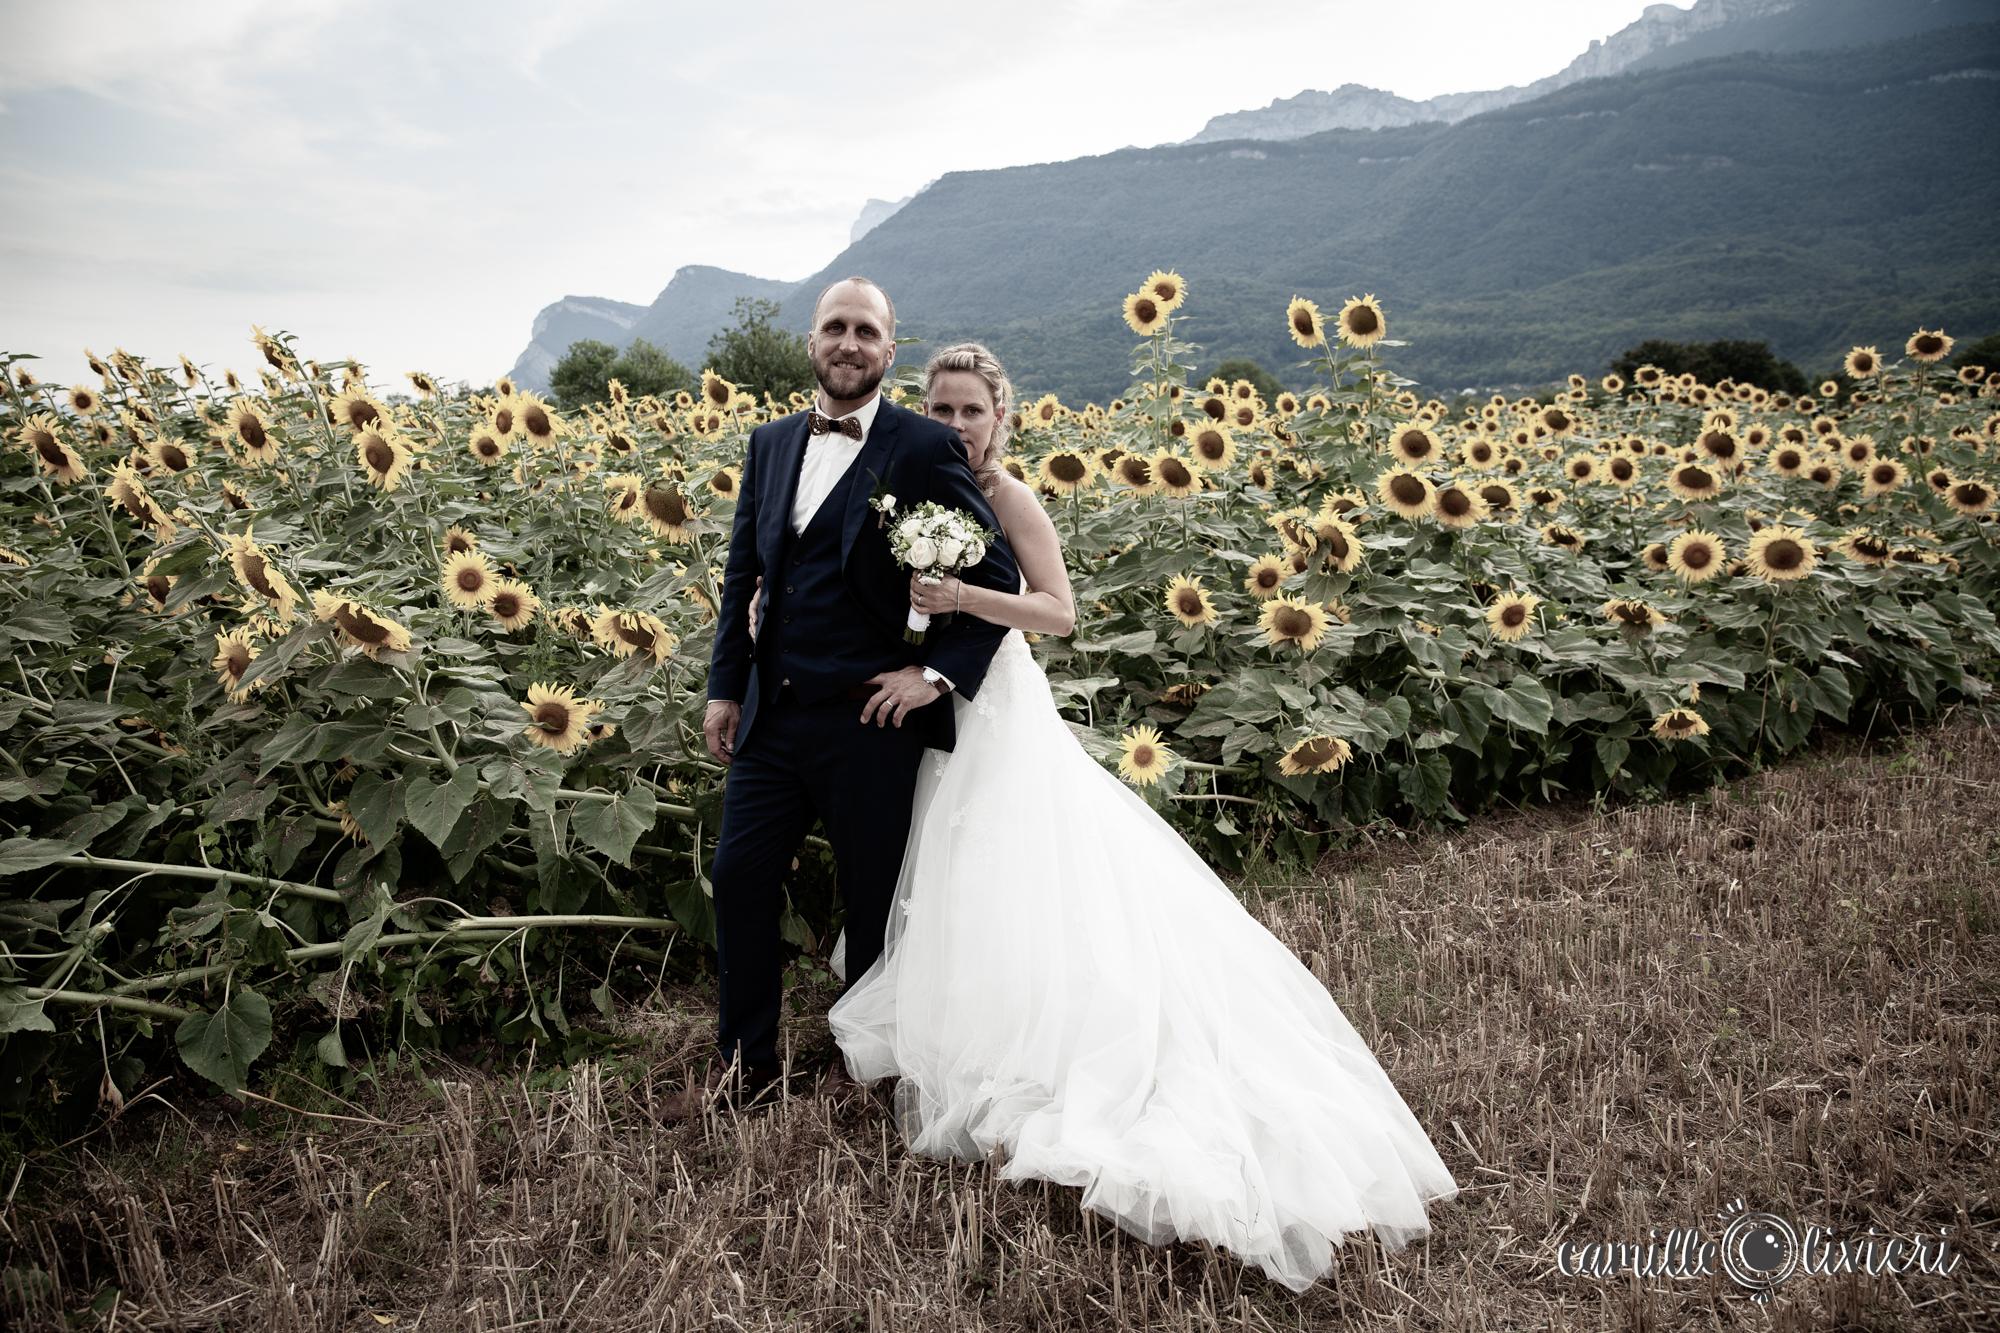 photographe_grenoble_mariage-camille-olivieri-122